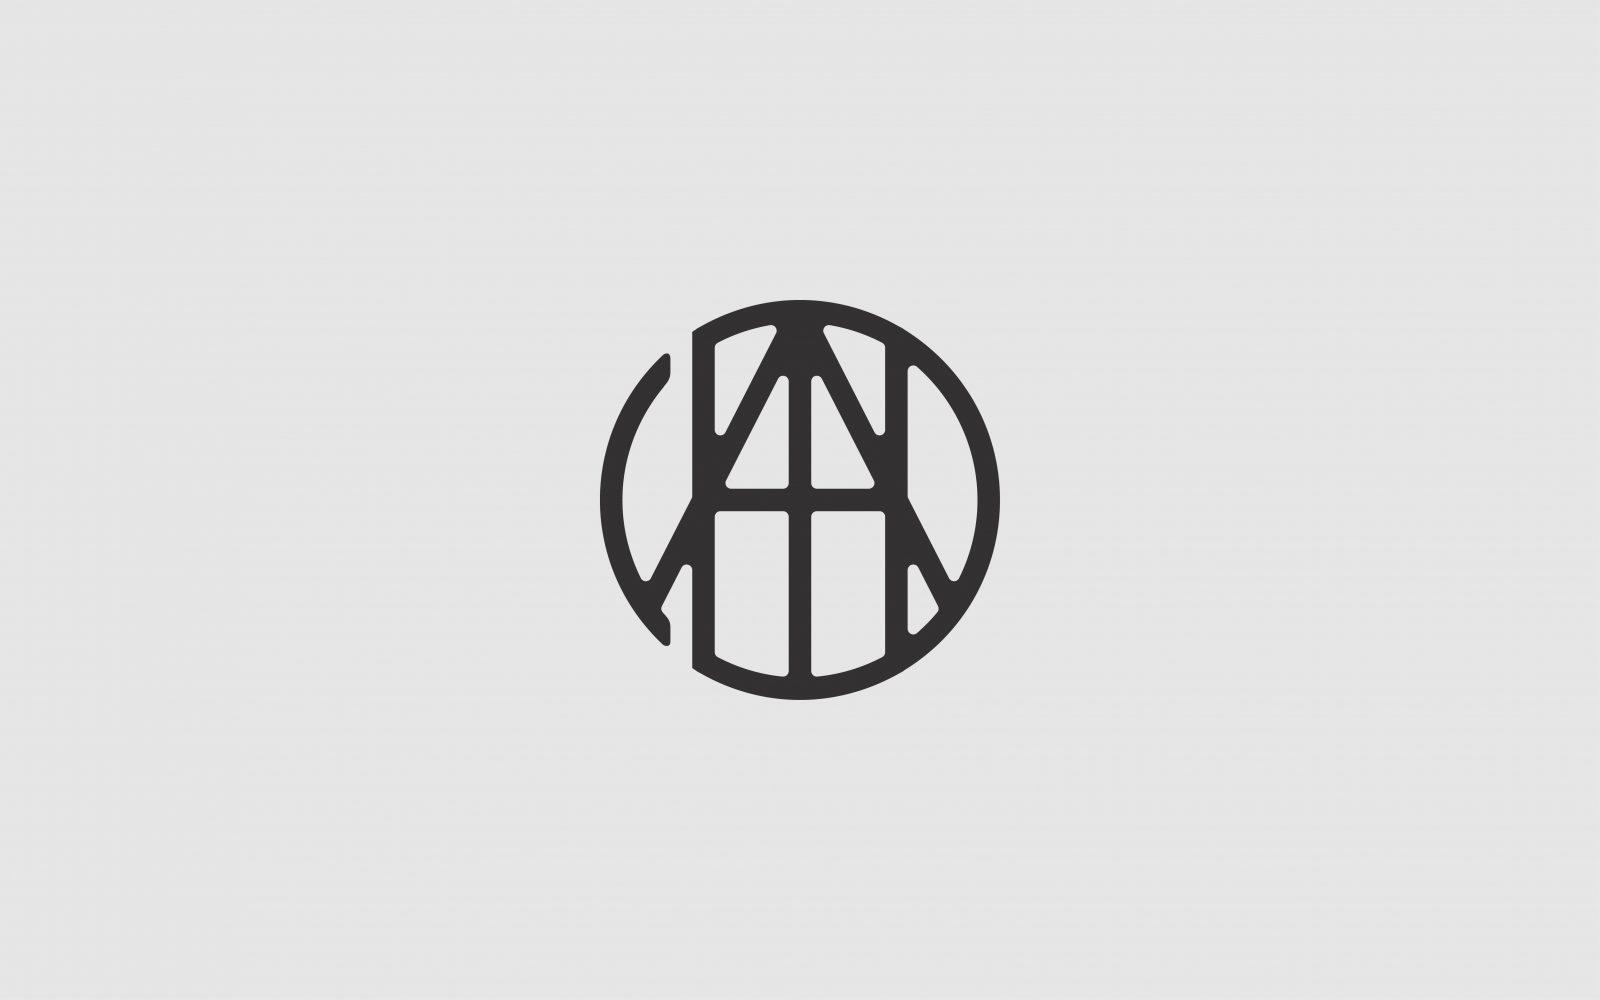 Various Logos & Brand Marks